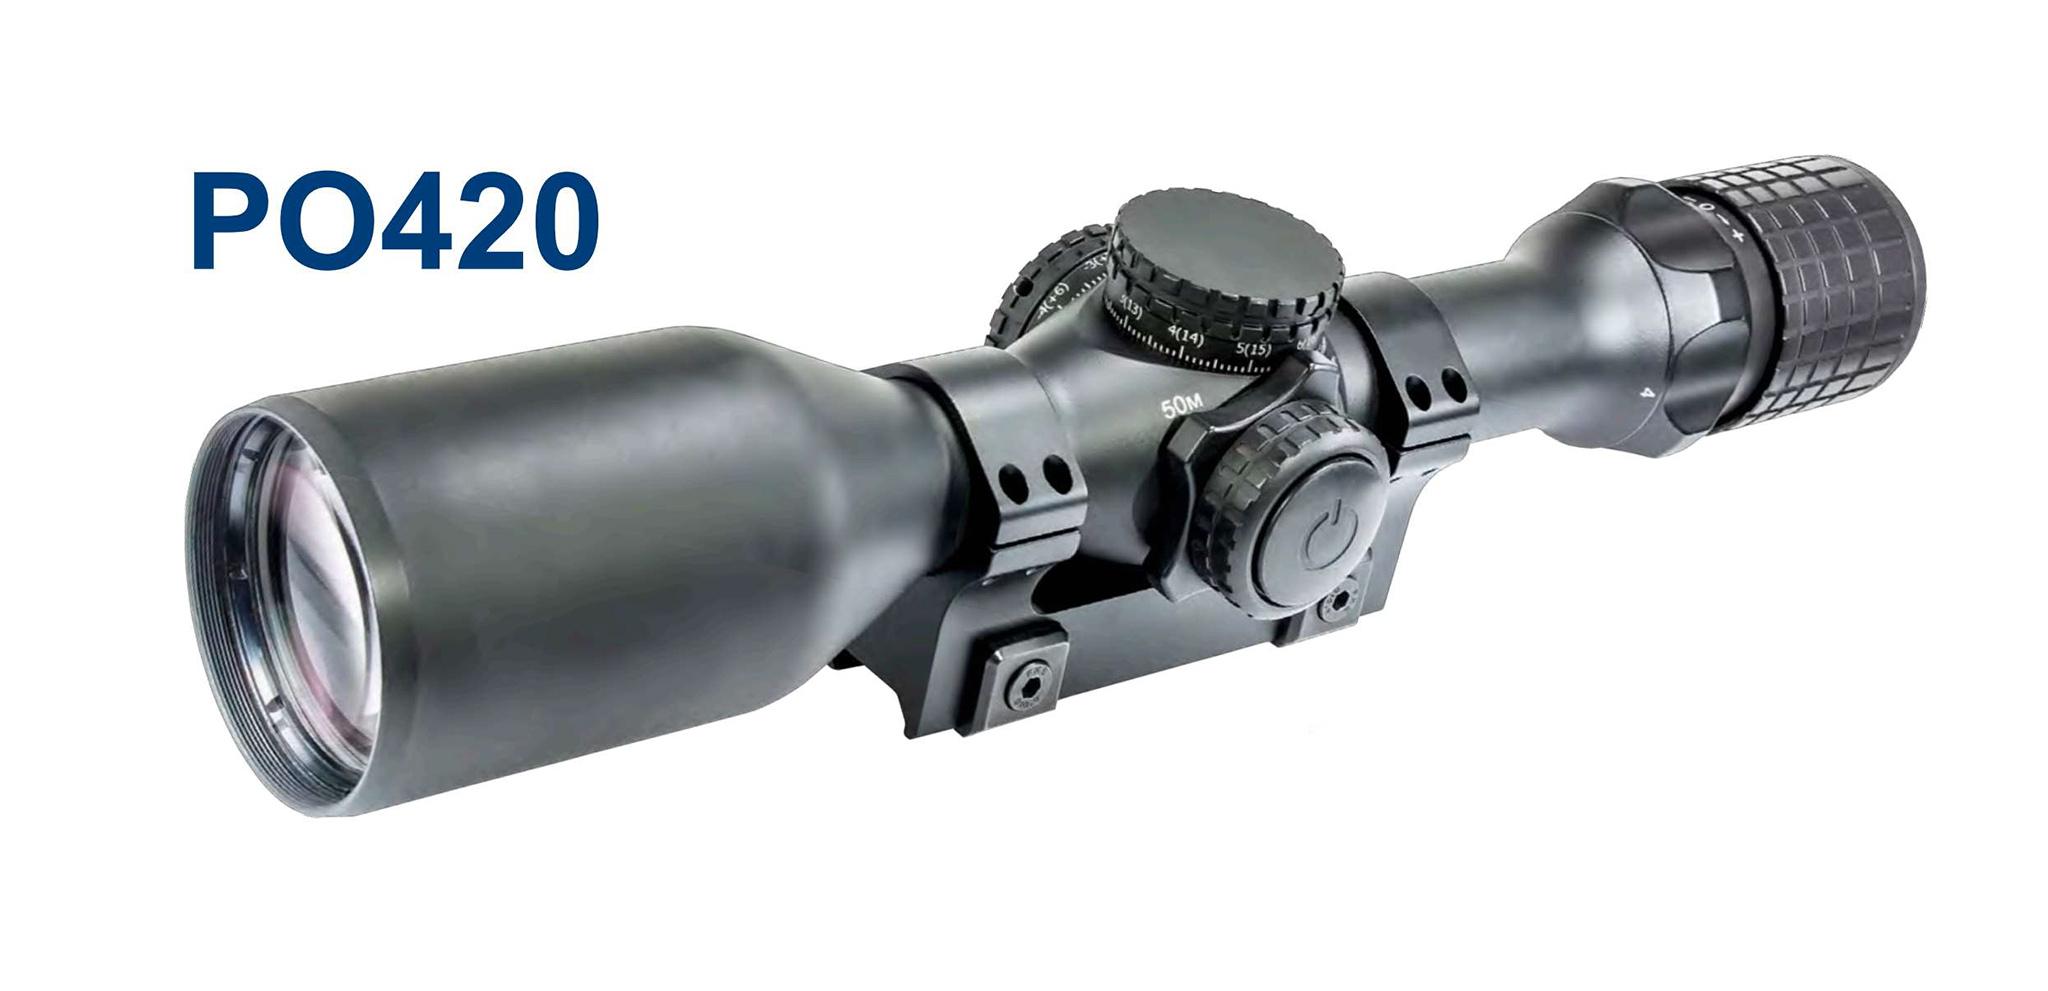 NPZ - PO 420